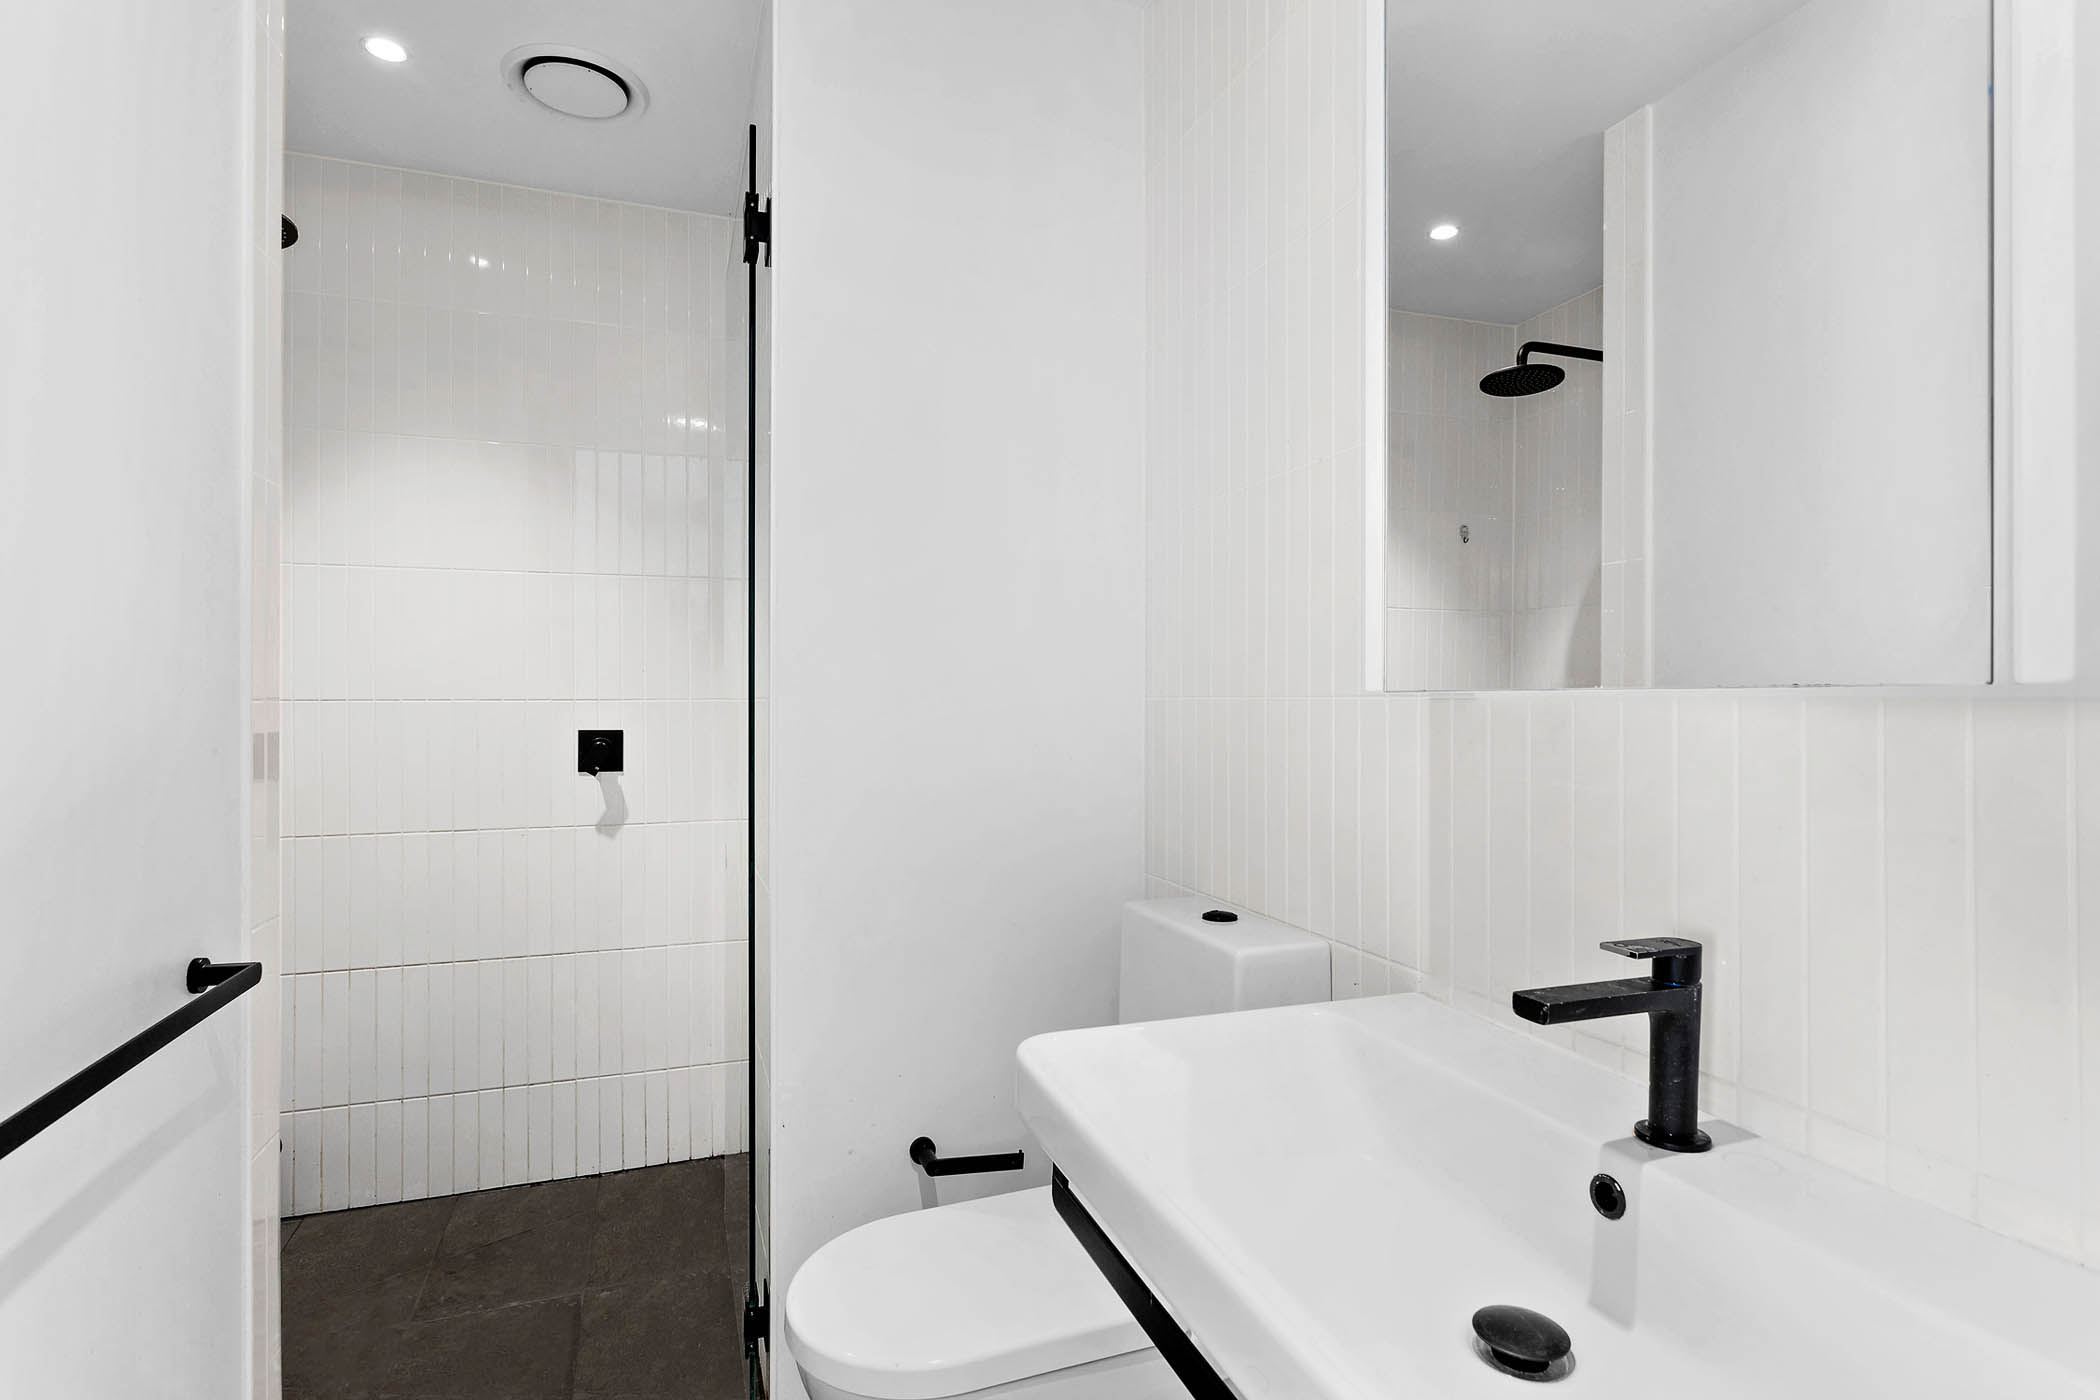 104/518-Swanston-Street,-Carlton-Student-Accommodation-Melbourne-Bathroom-Unilodgers